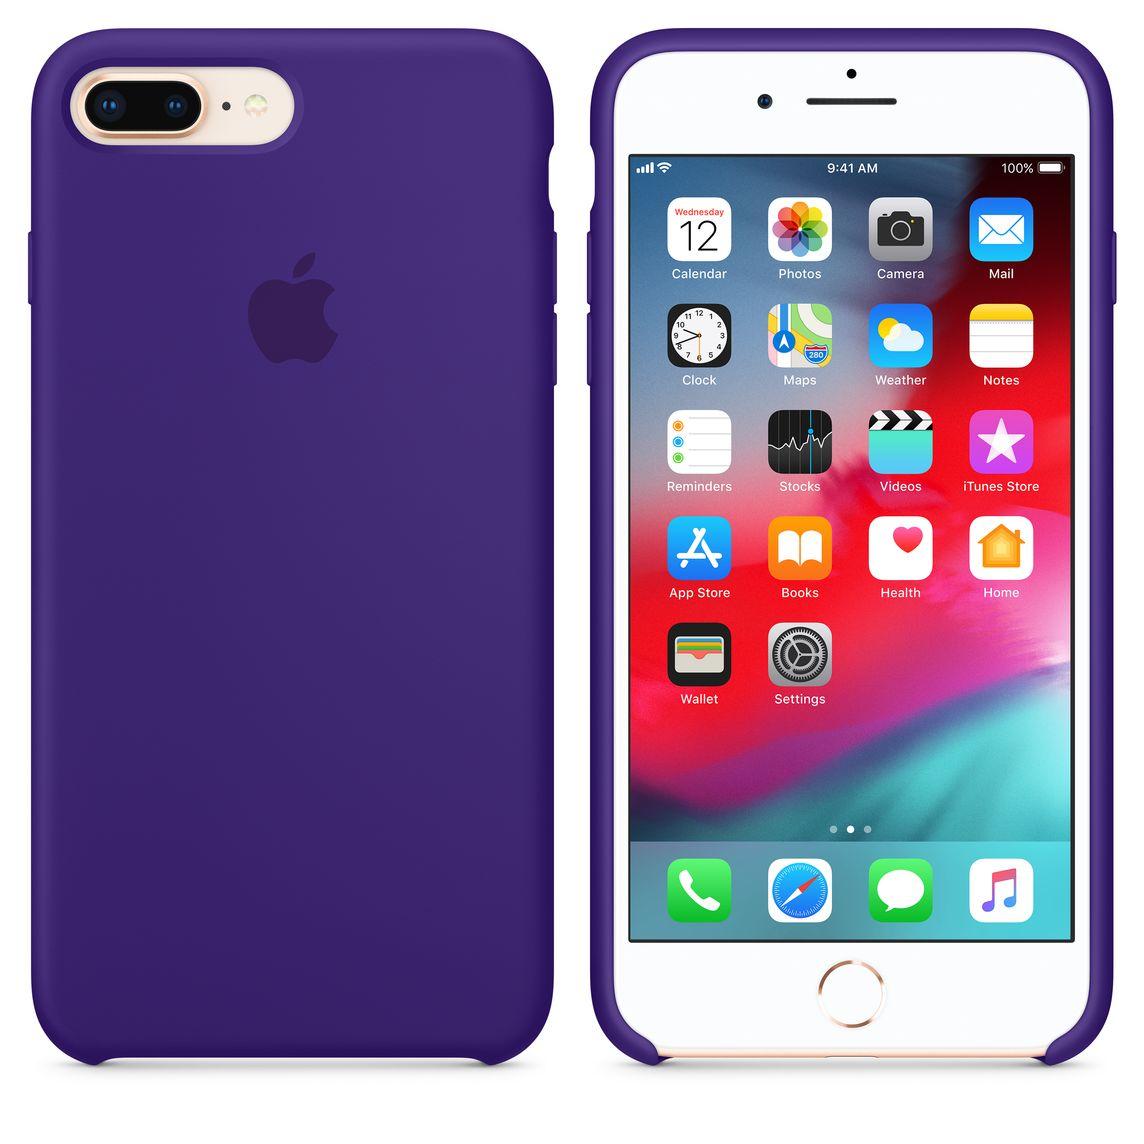 hot sale online 6b35c 3b5a5 iPhone 8 Plus / 7 Plus Silicone Case - Ultra Violet